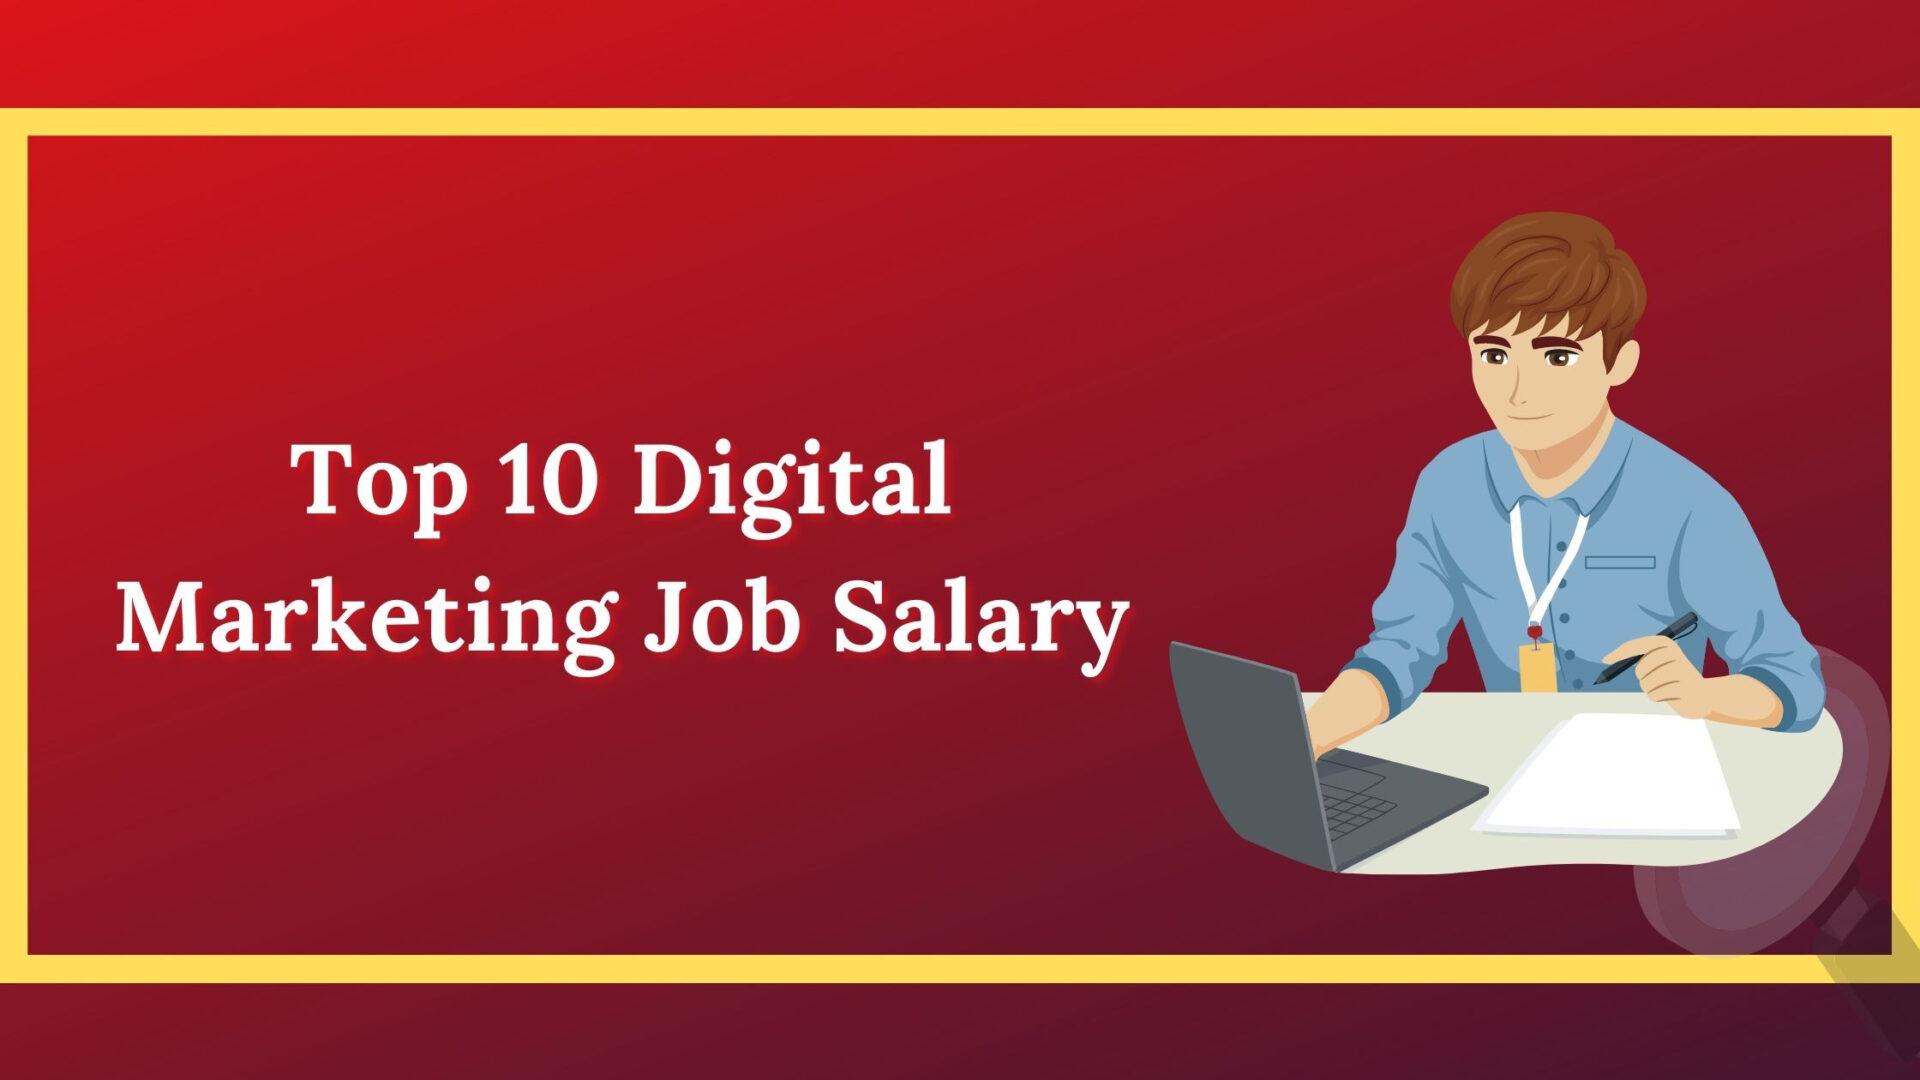 sa_1631112991_Top 10 Digital Marketing Job Salary